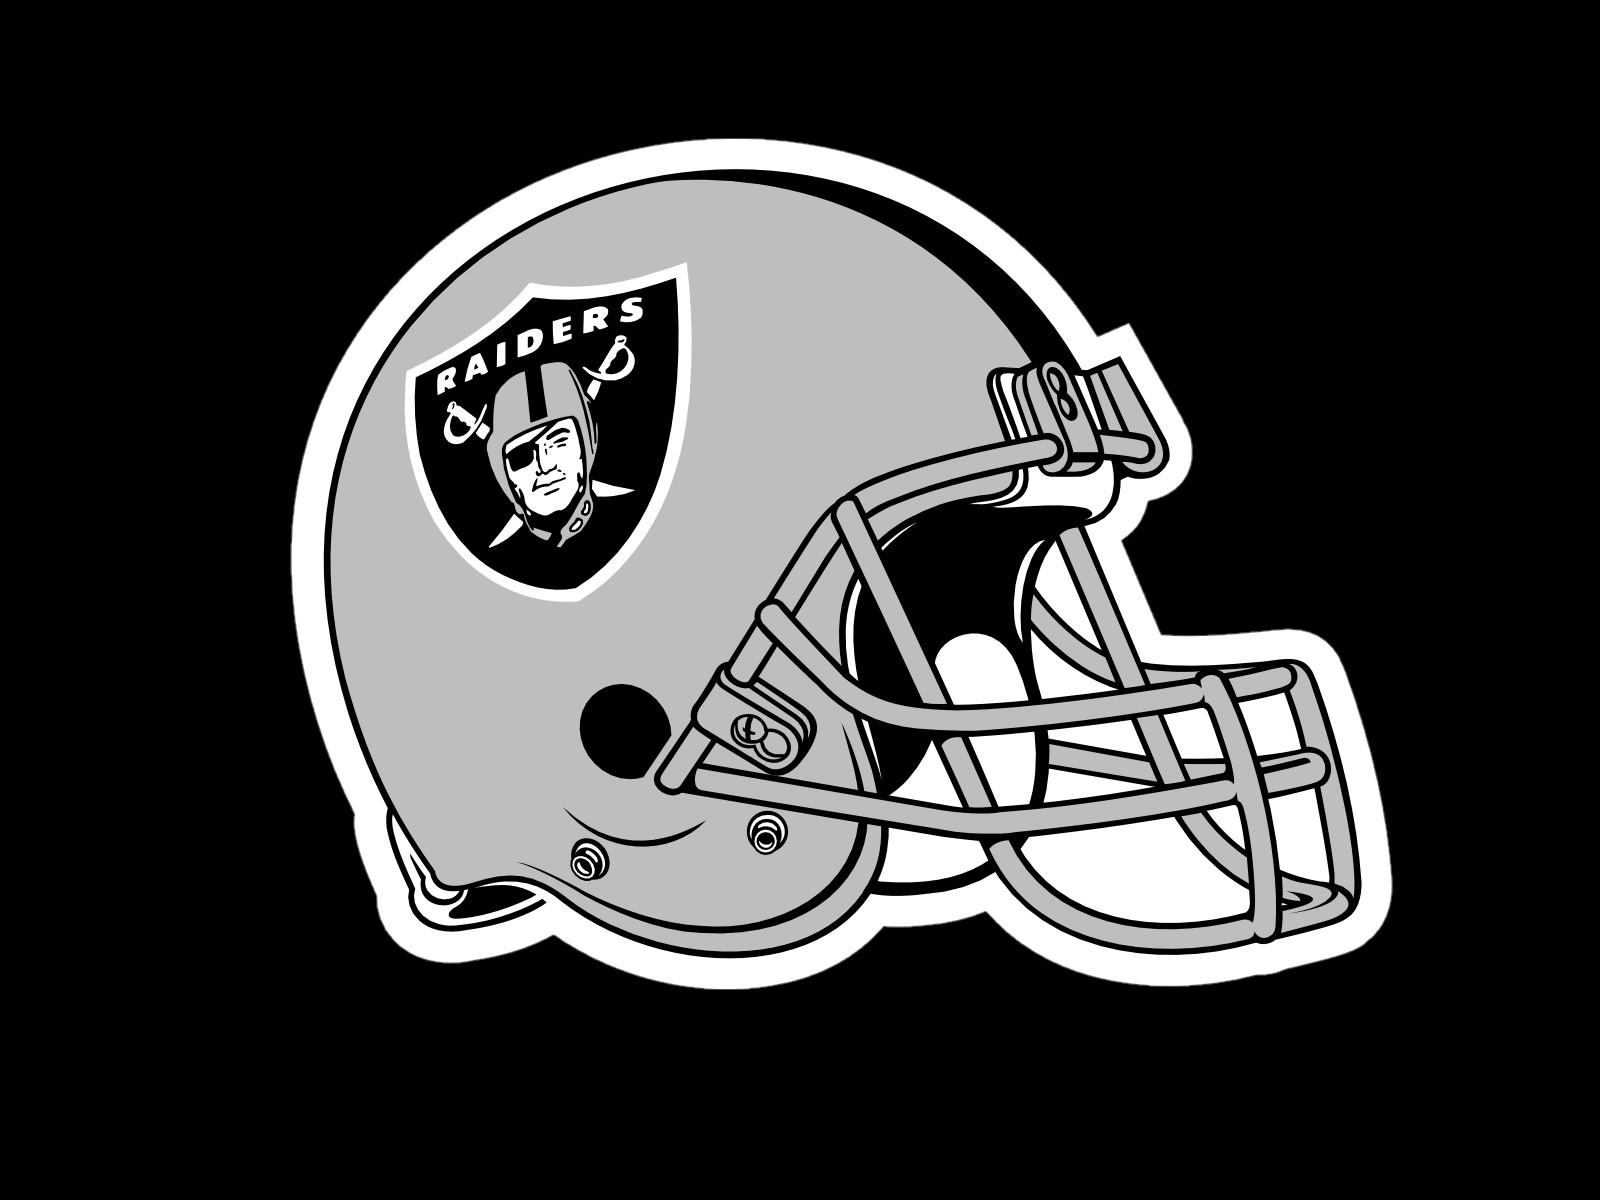 oakland-raiders-helmet-logo-on_1600x1200_1061.jpg